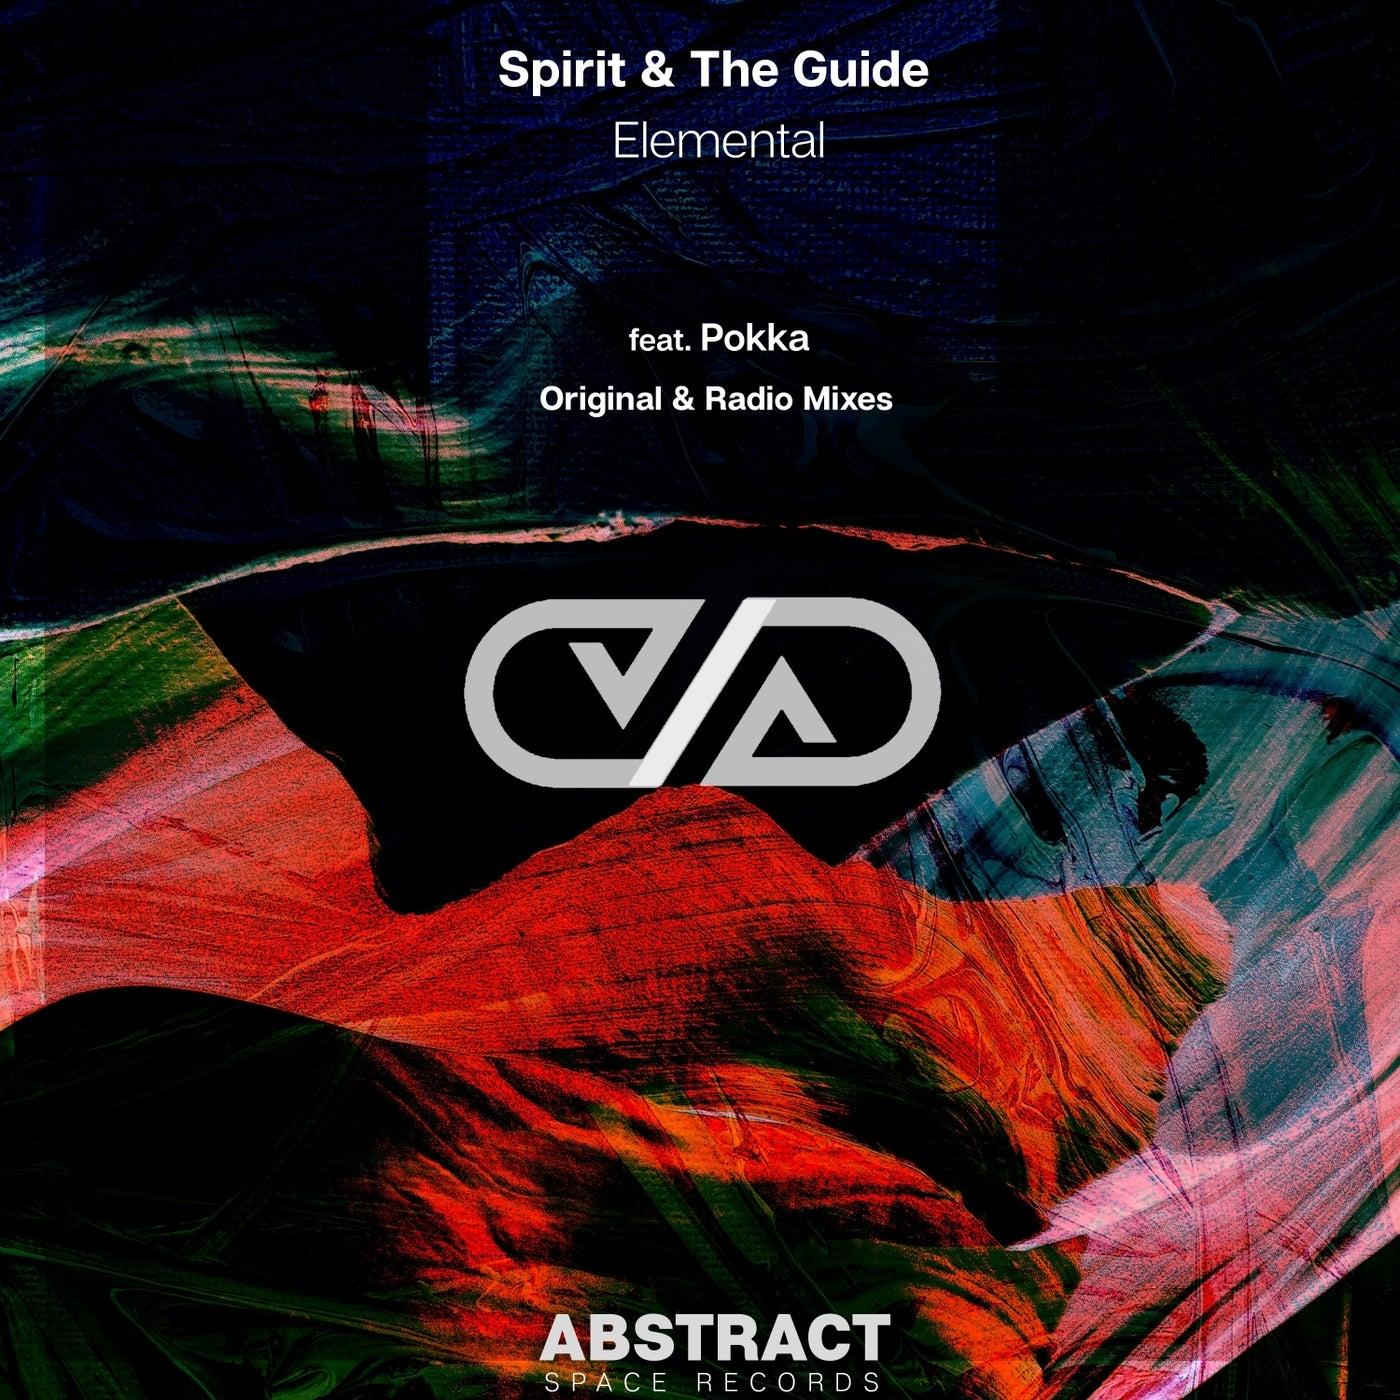 Spirit & the Guide Ft. Pokka - Elemental